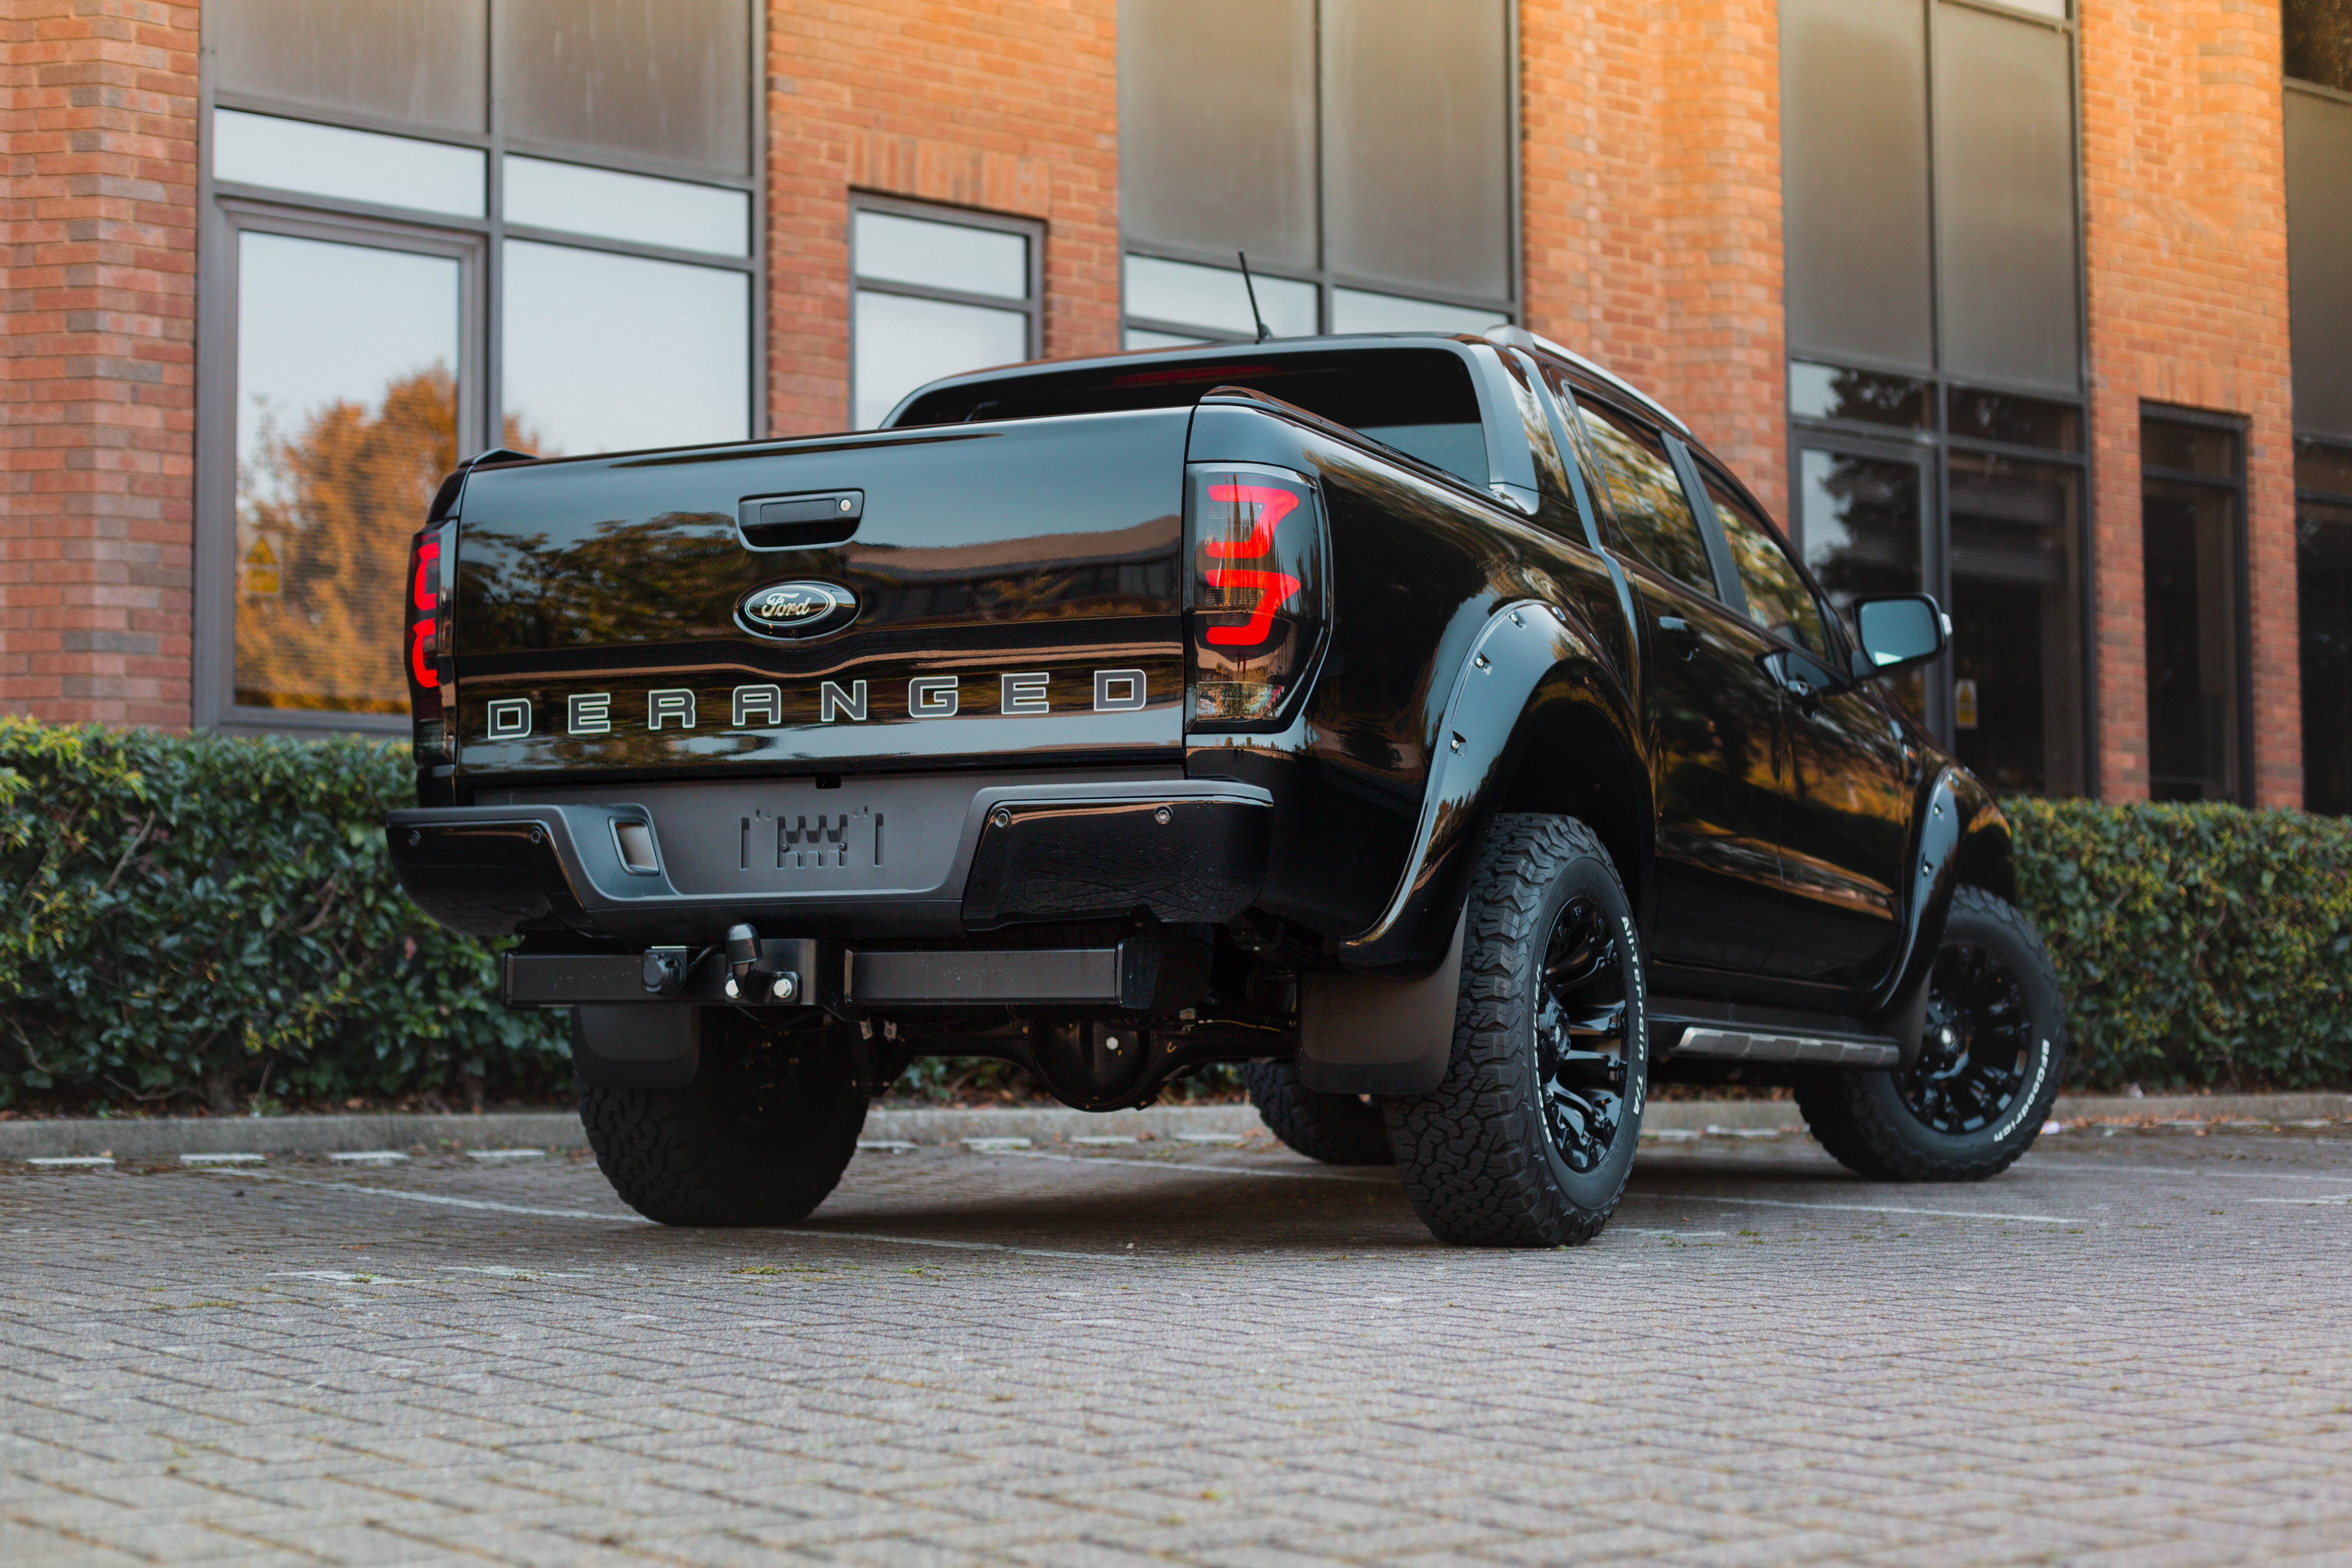 2020 20 Deranged Ford Ranger Wildtrak 2 0 Bi Turbo